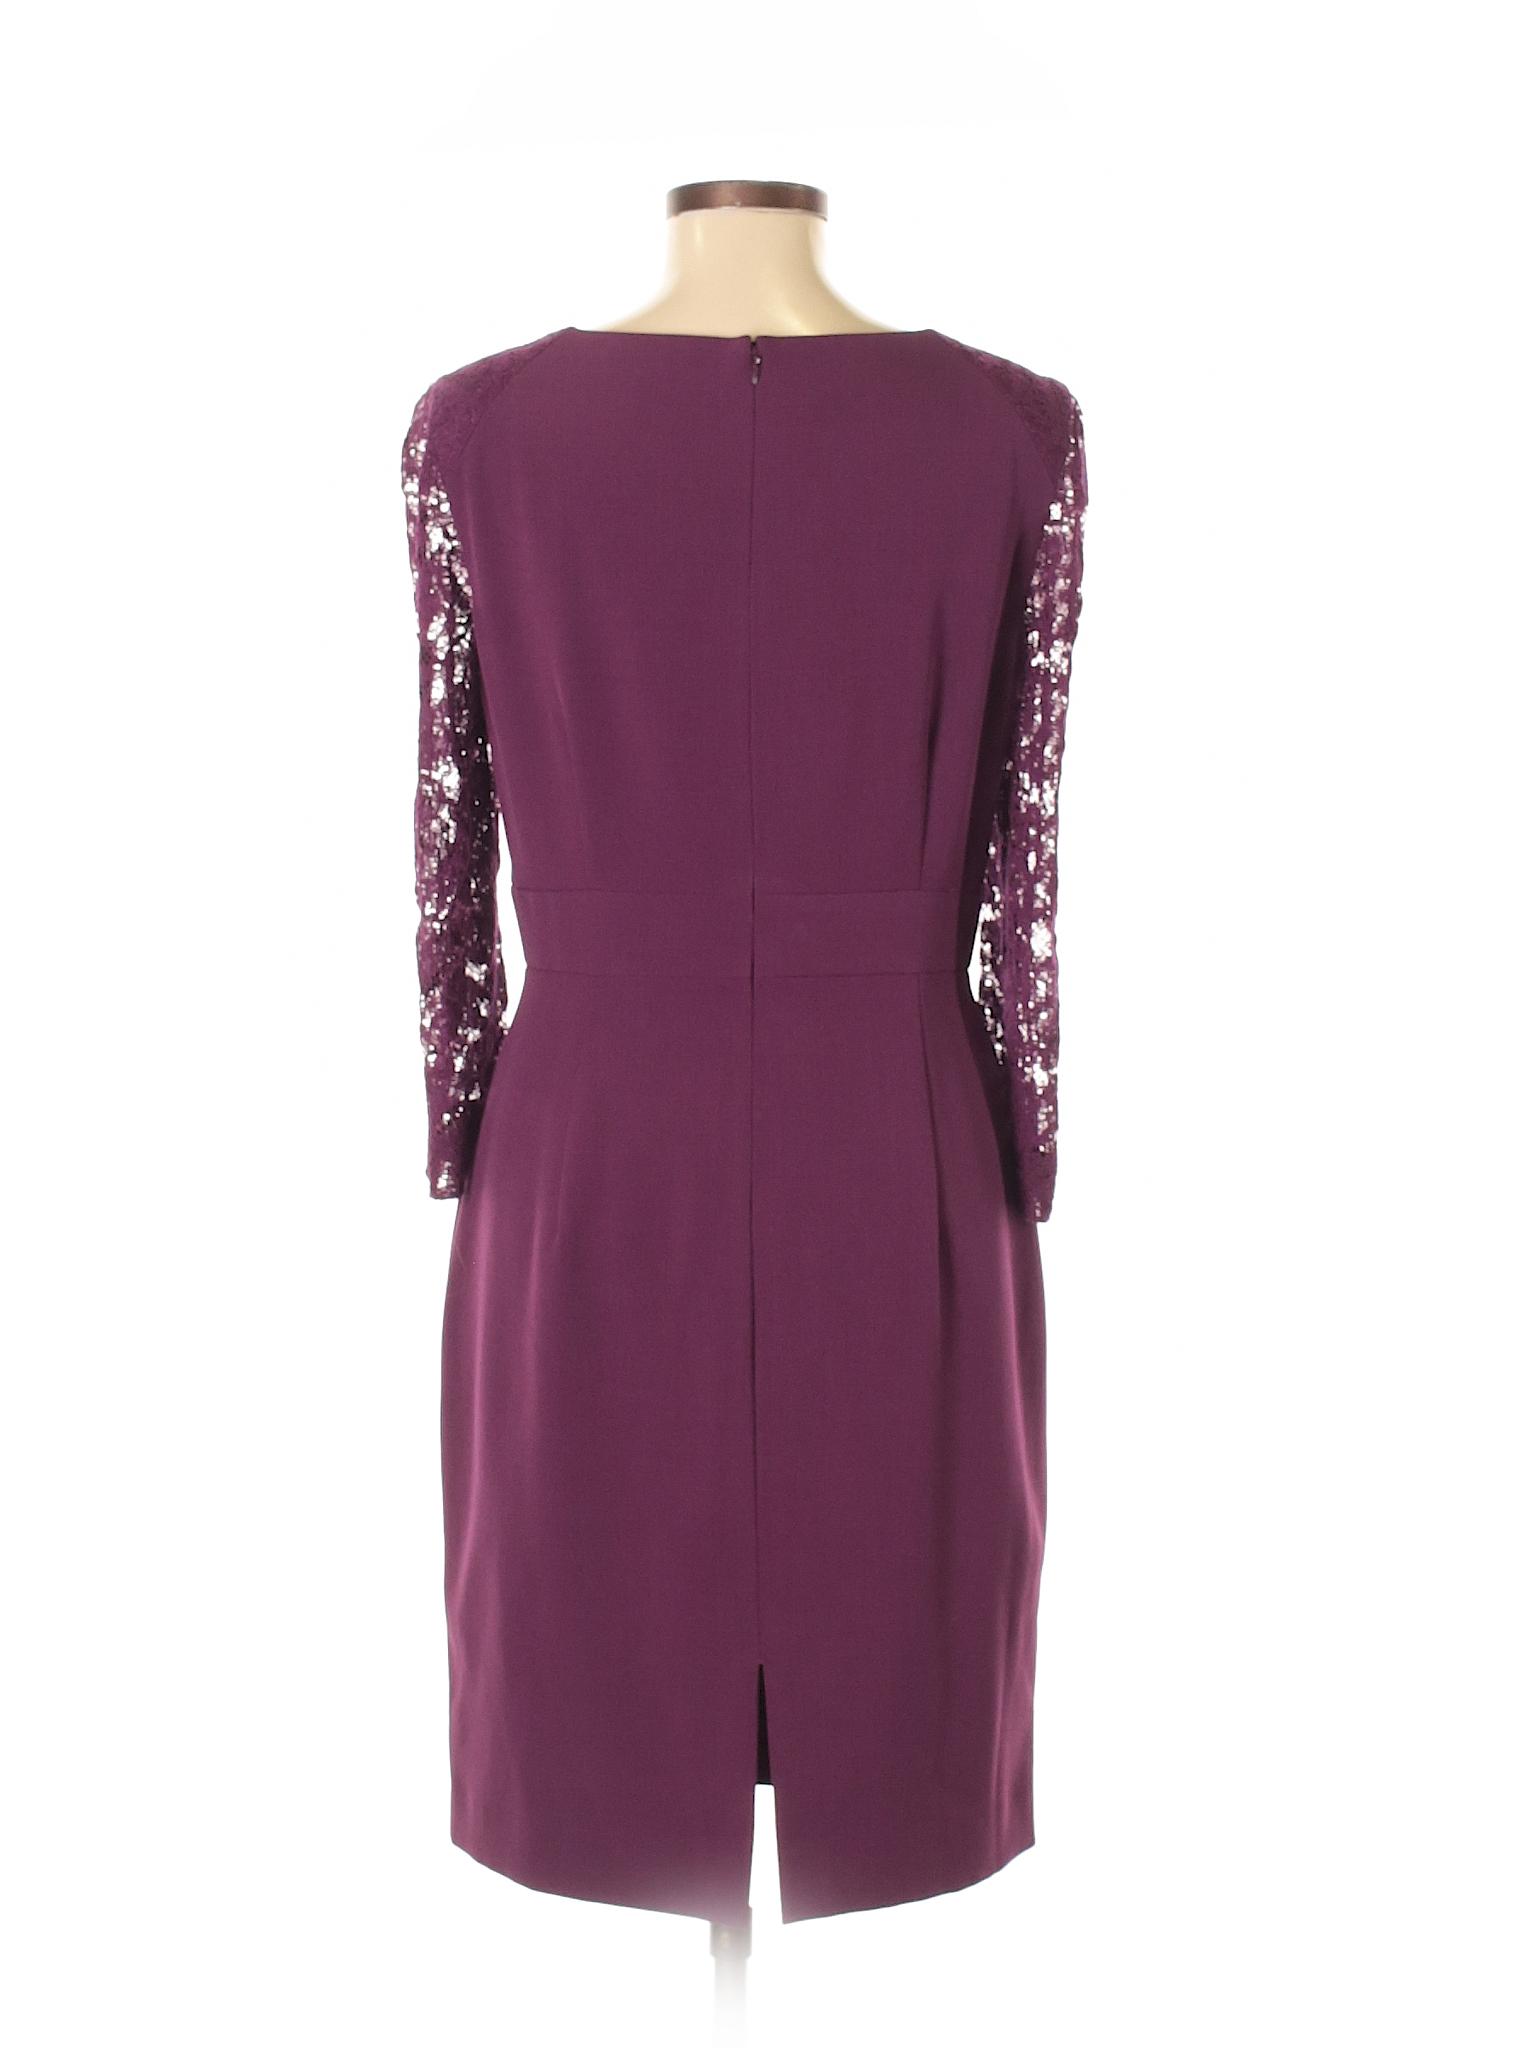 Dress Marie Casual Boutique winter Alex q7Ewpn6xI